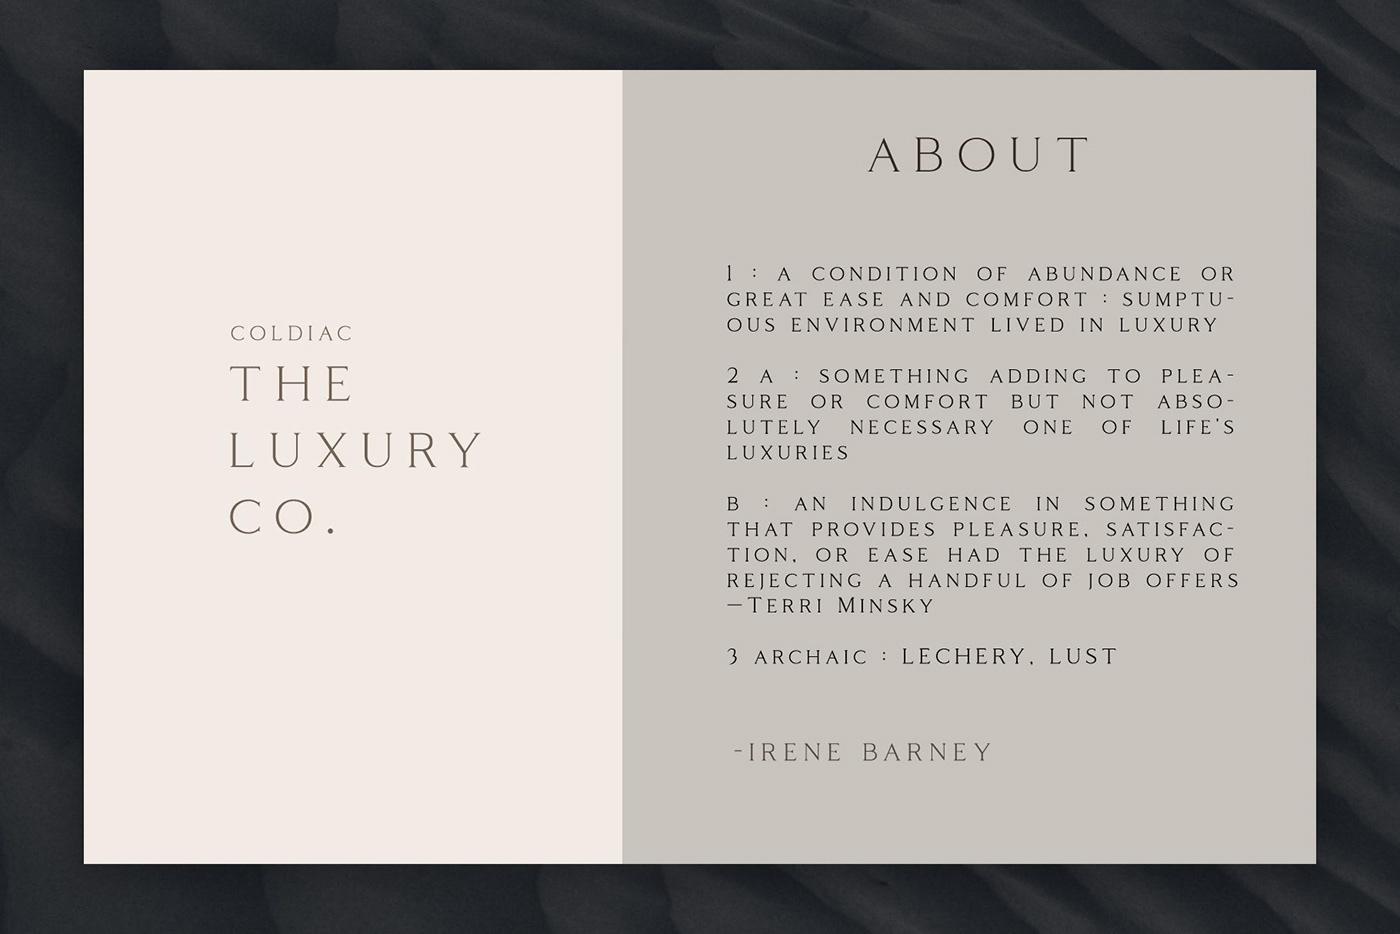 Free font download freebies luxury serif clean elegant free Typeface classy